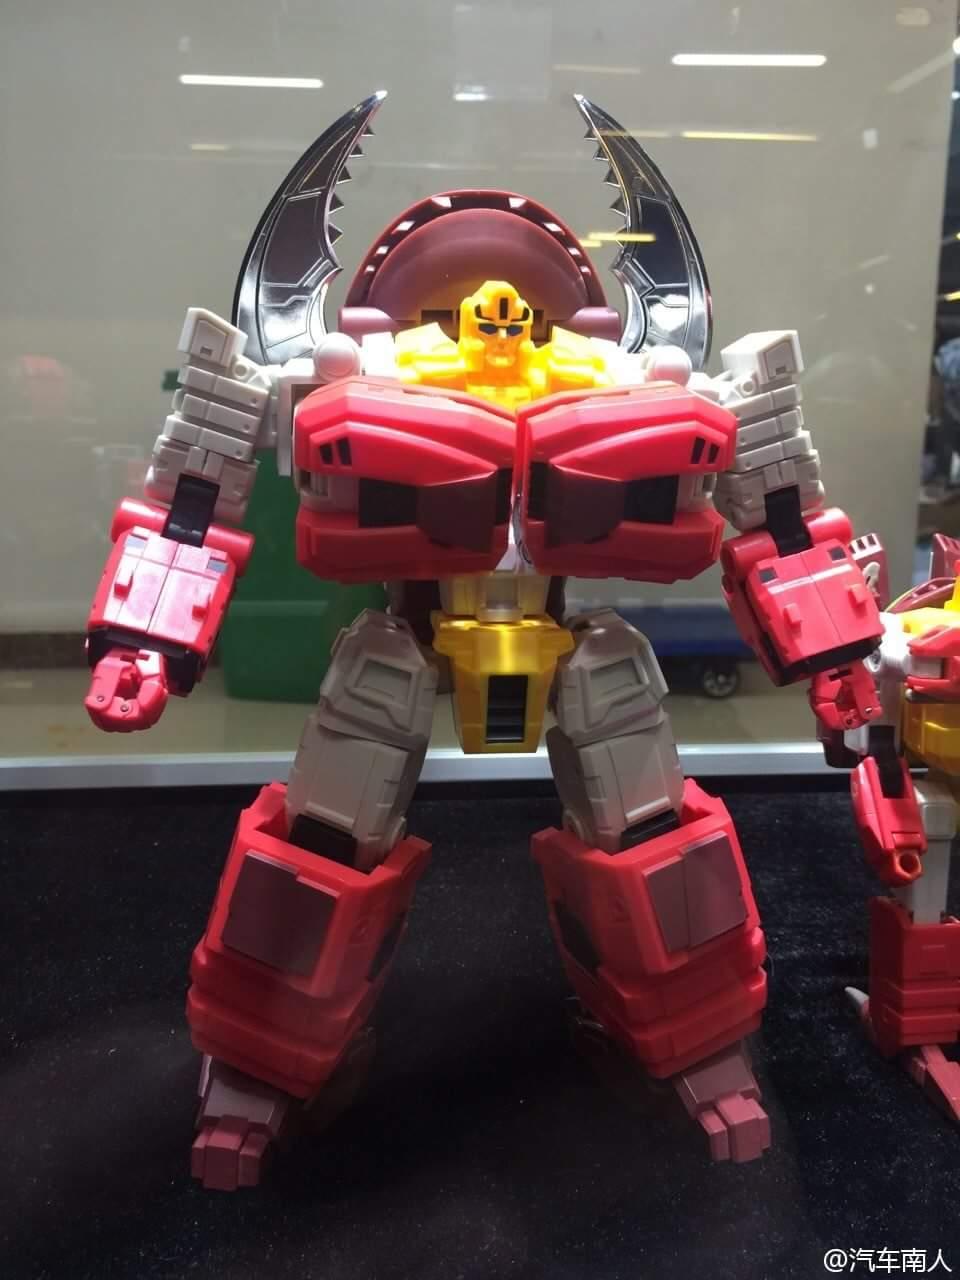 [FansHobby] Produit Tiers - Master Builder MB-02/03/05 - aka Monsterbots/Monstrebots GHMd5Fm6